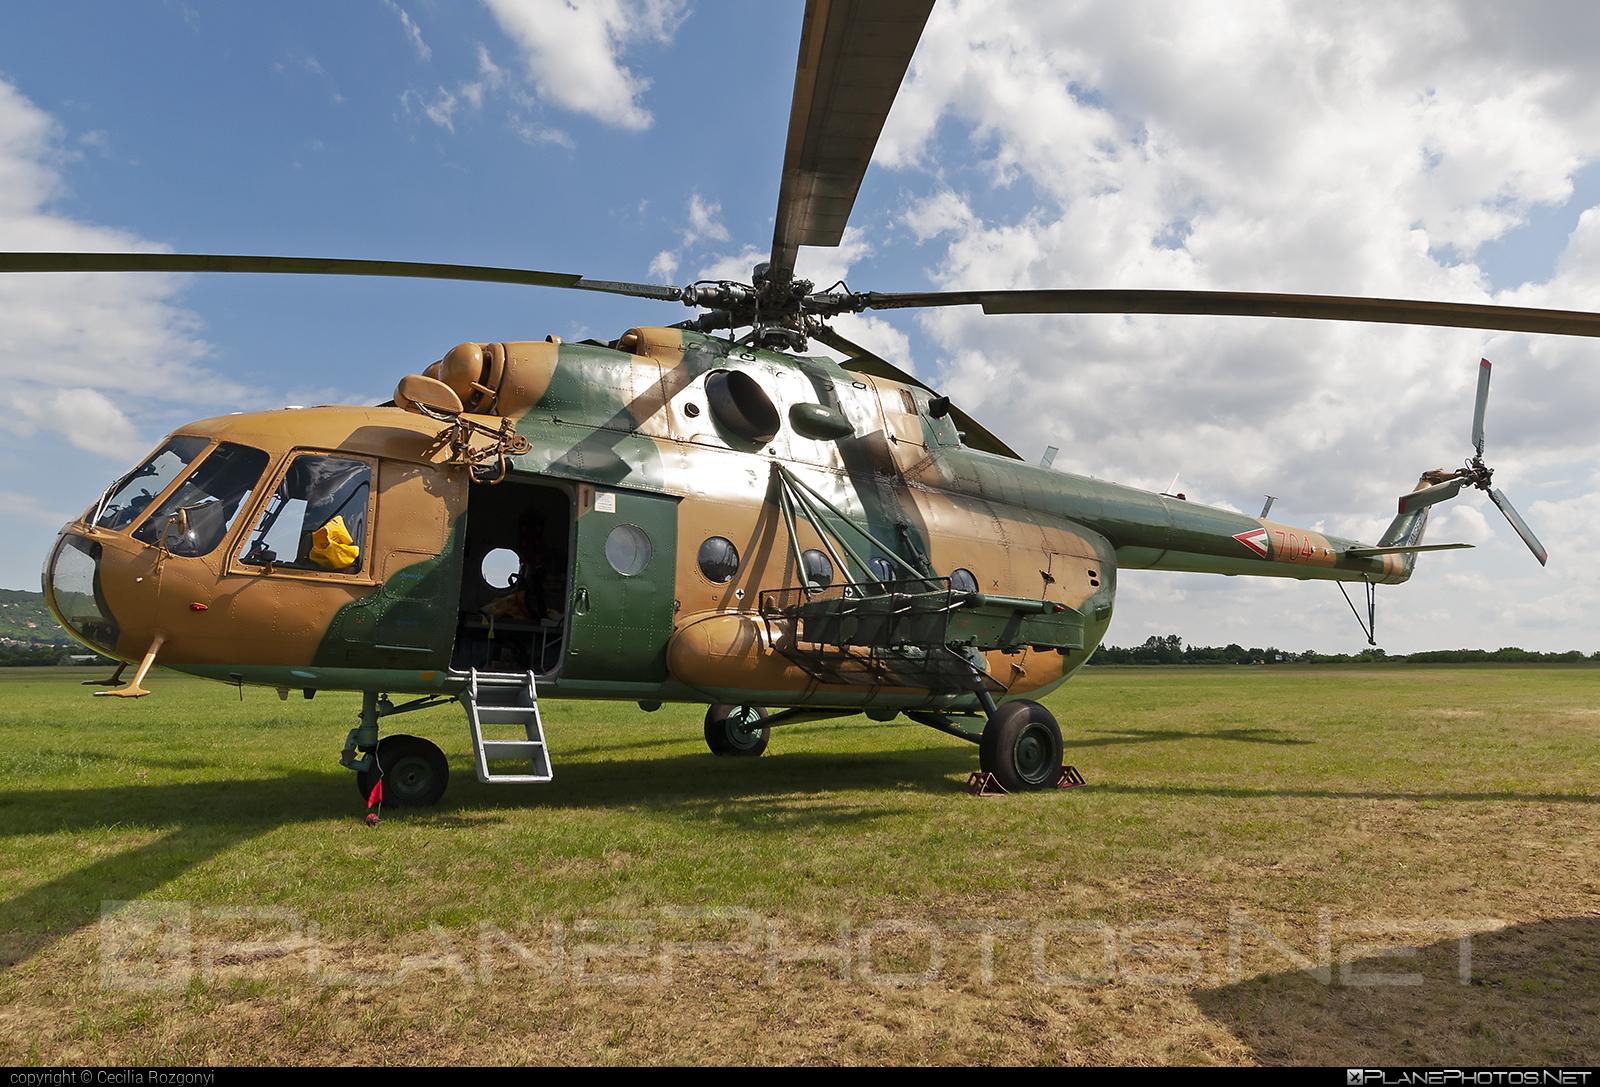 704 - Mil Mi-17N operated by Magyar Légierő (Hungarian Air Force